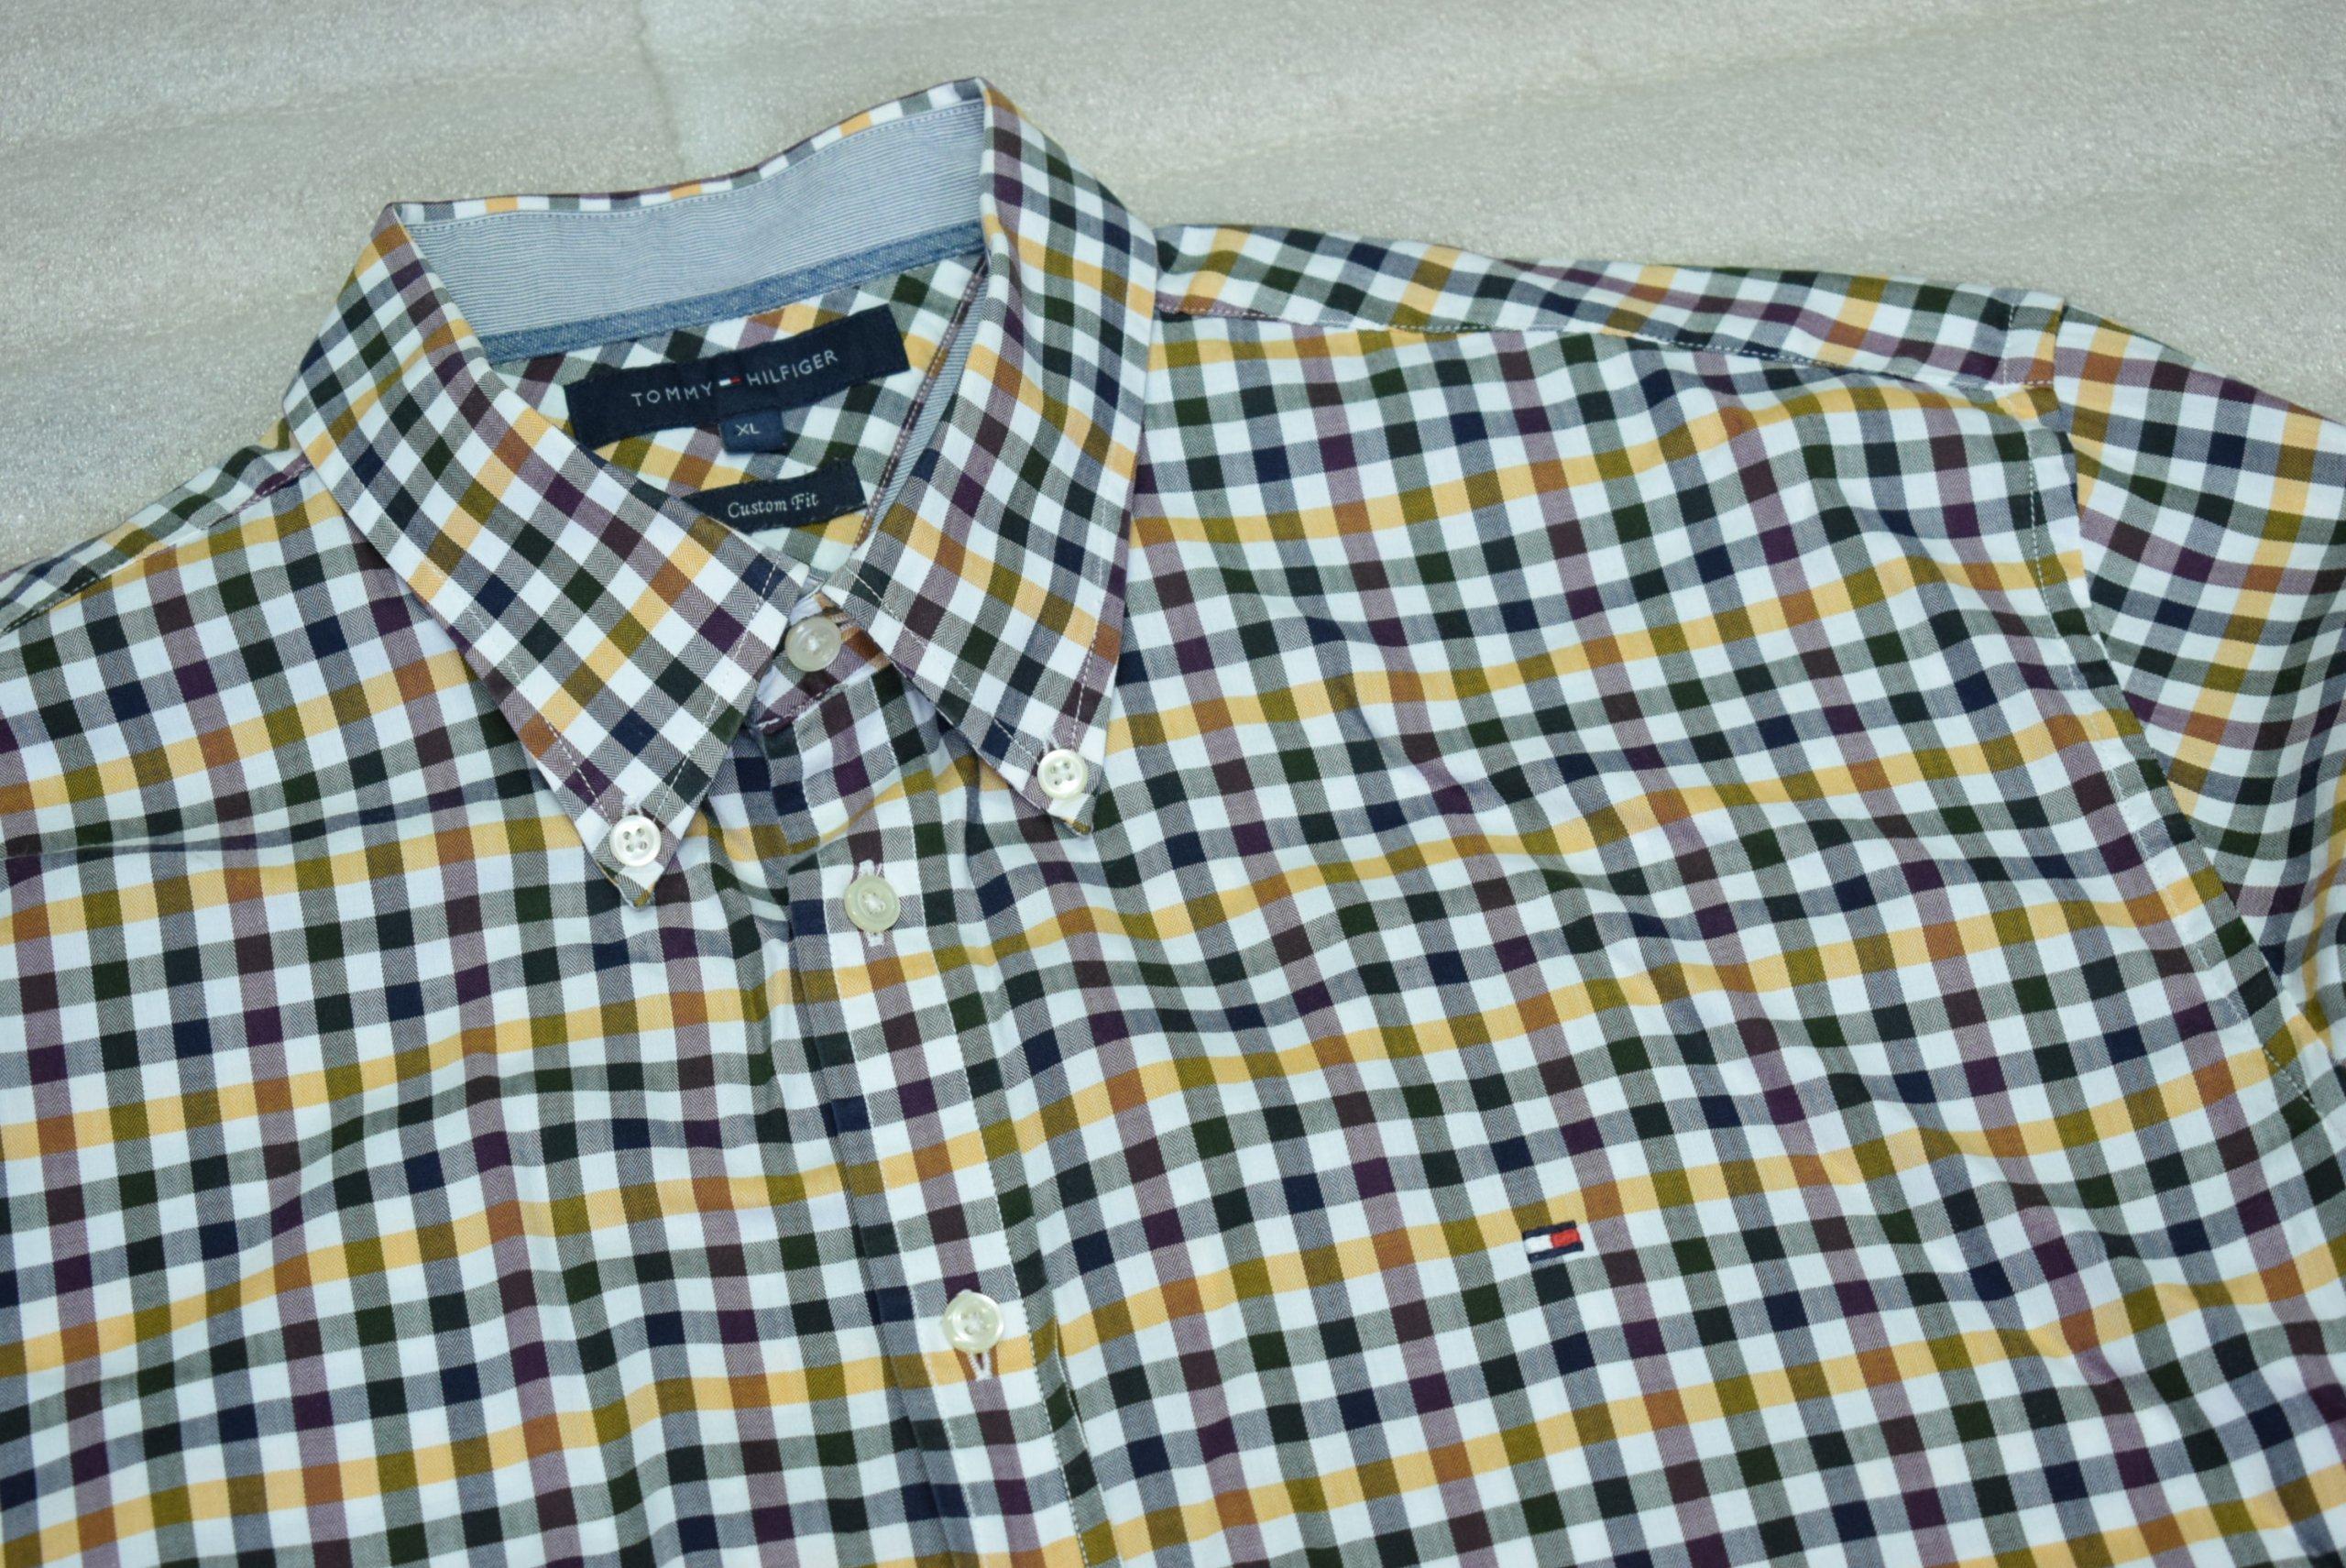 TOMMY HILFIGER SHIRT Koszula Kratka NEW XL^